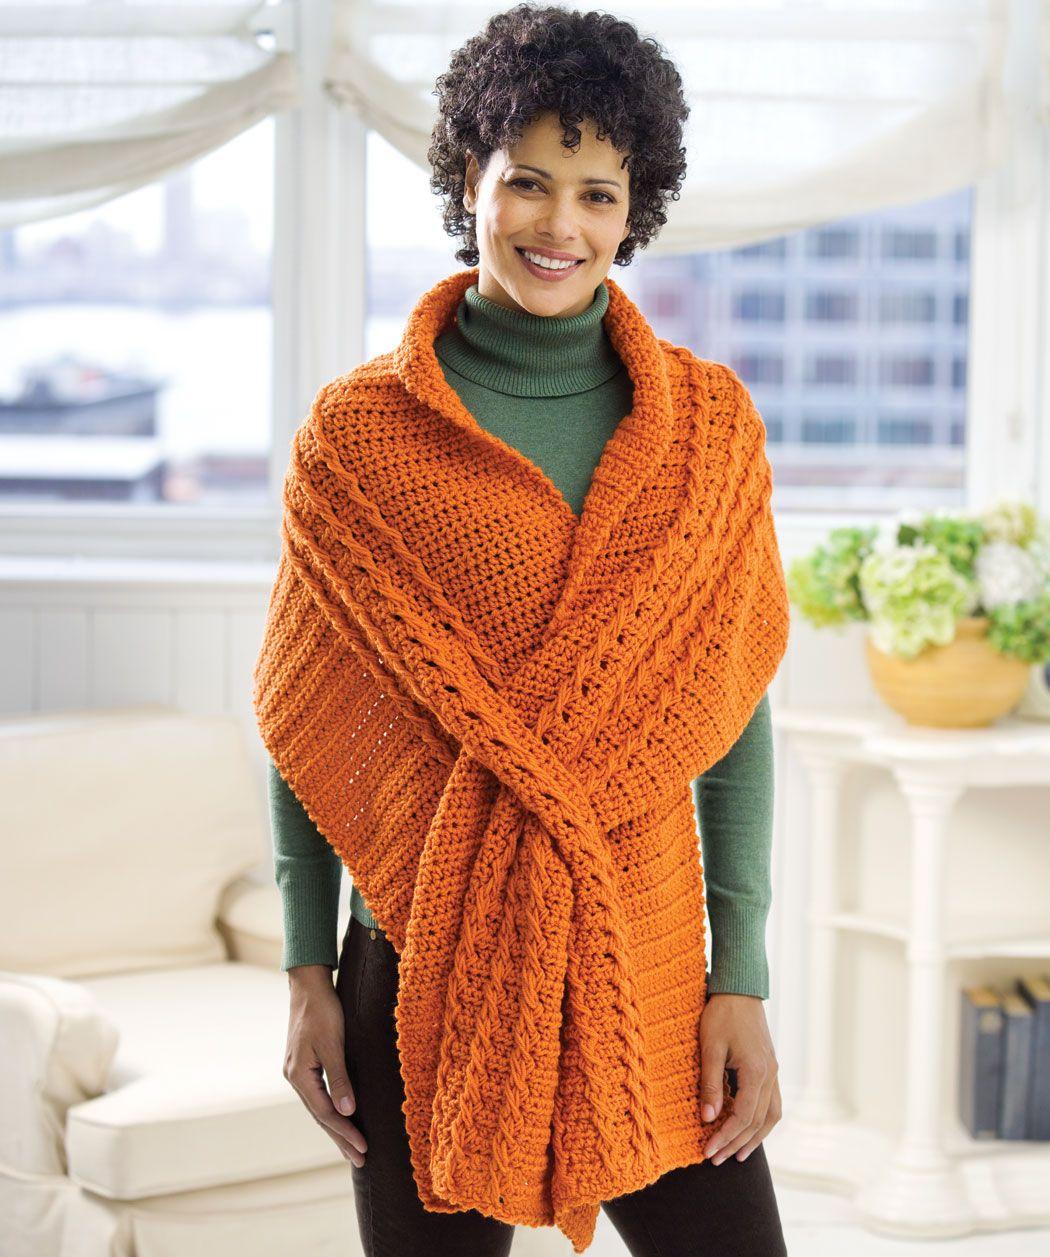 Crochet Wrap with Slits: free pattern